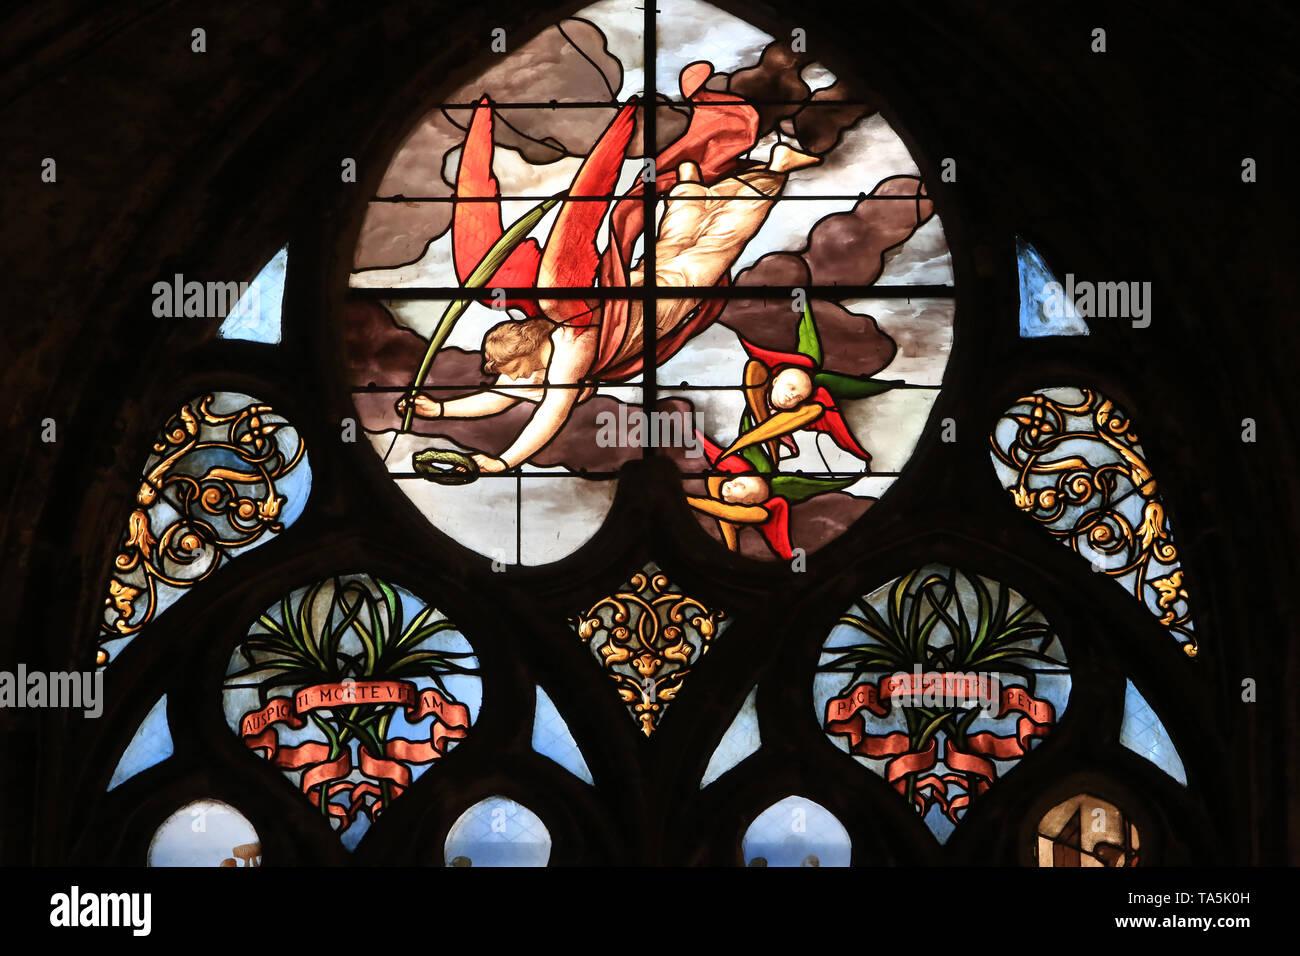 Eglise Saint-Nizier de Lyon. / Kirche Saint-Nizier. Lyon. Stockbild